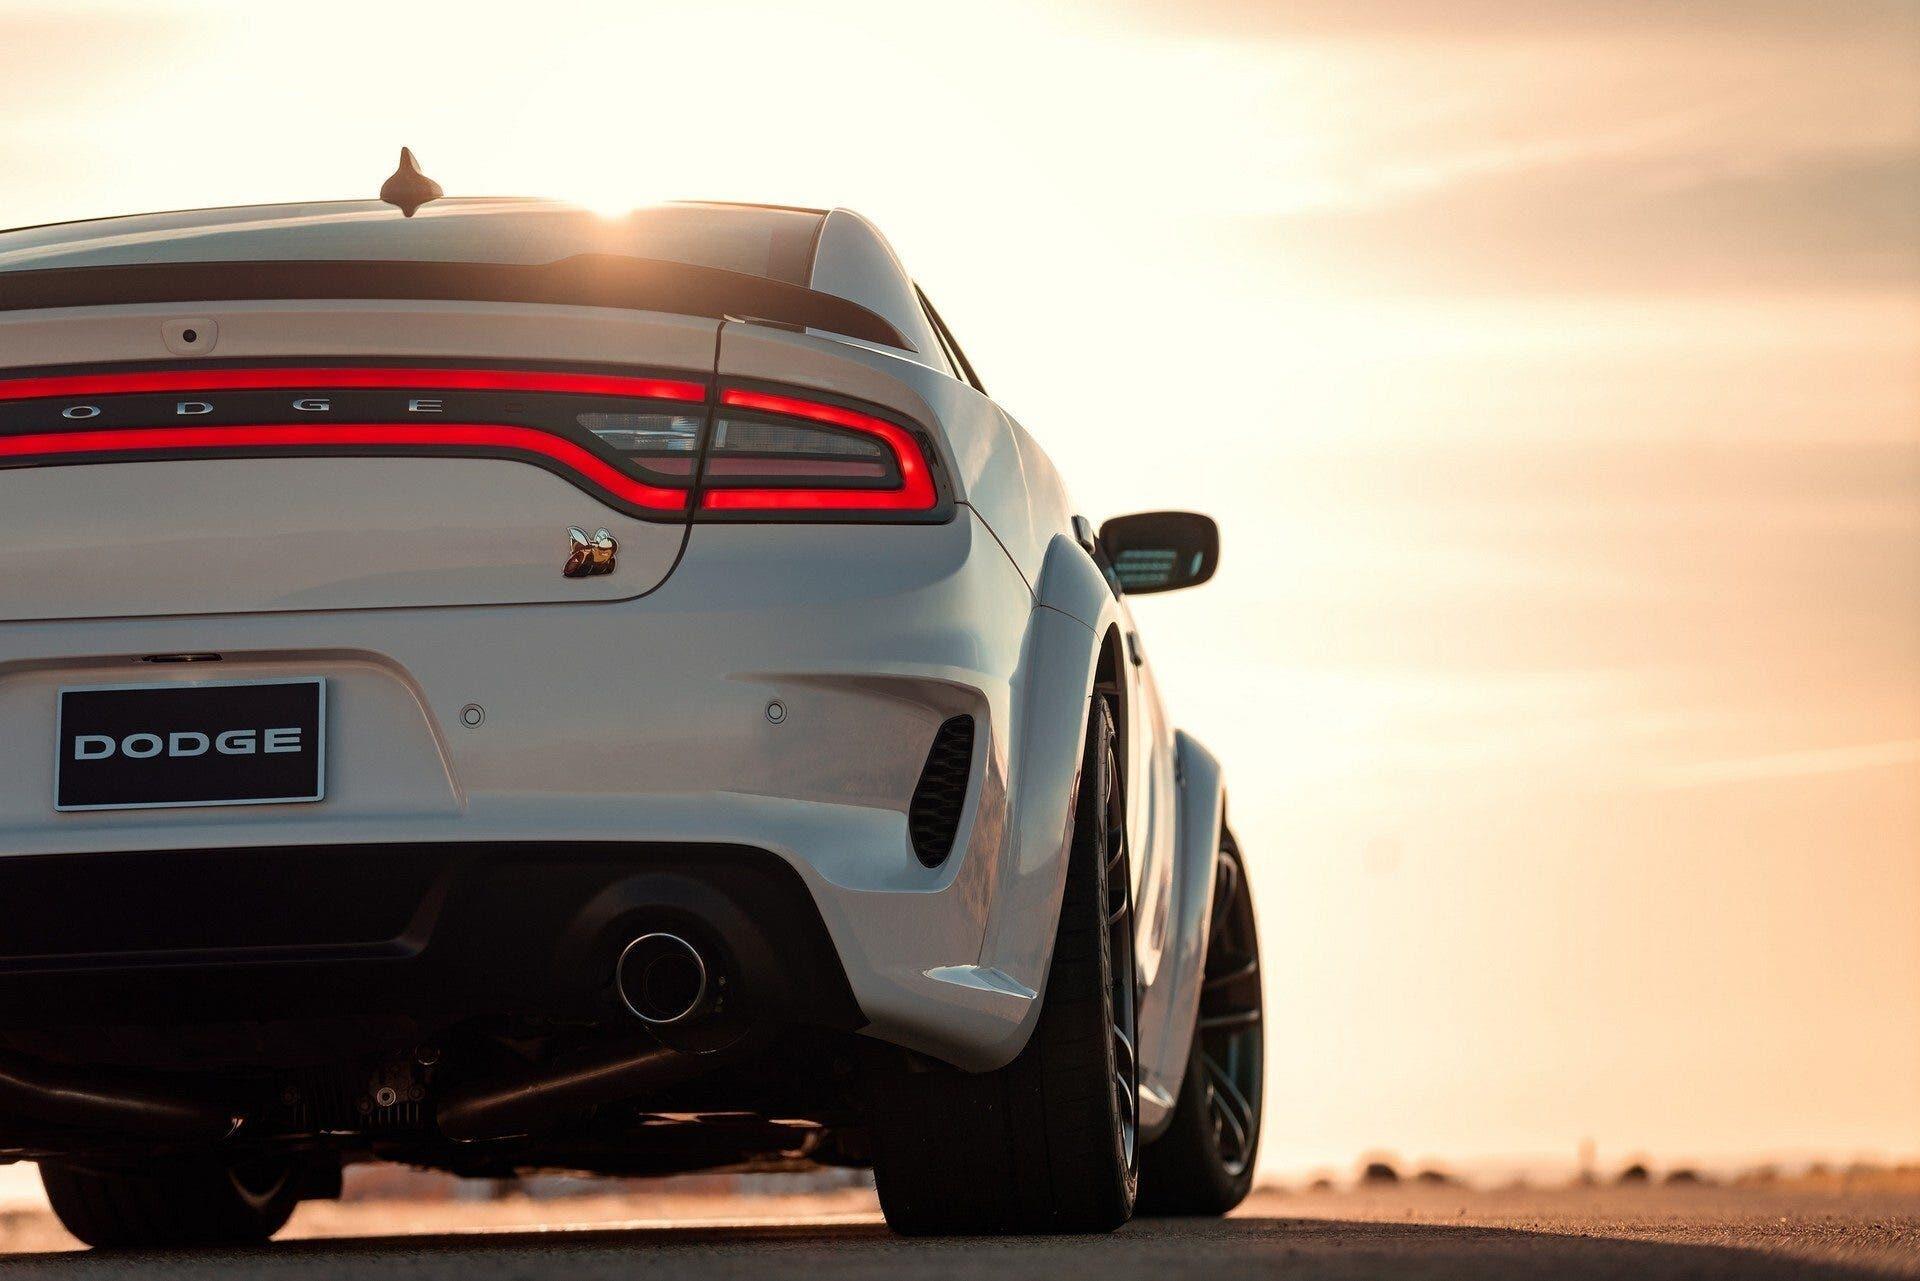 Dodge Charger SRT Hellcat Scat Pack Widebody